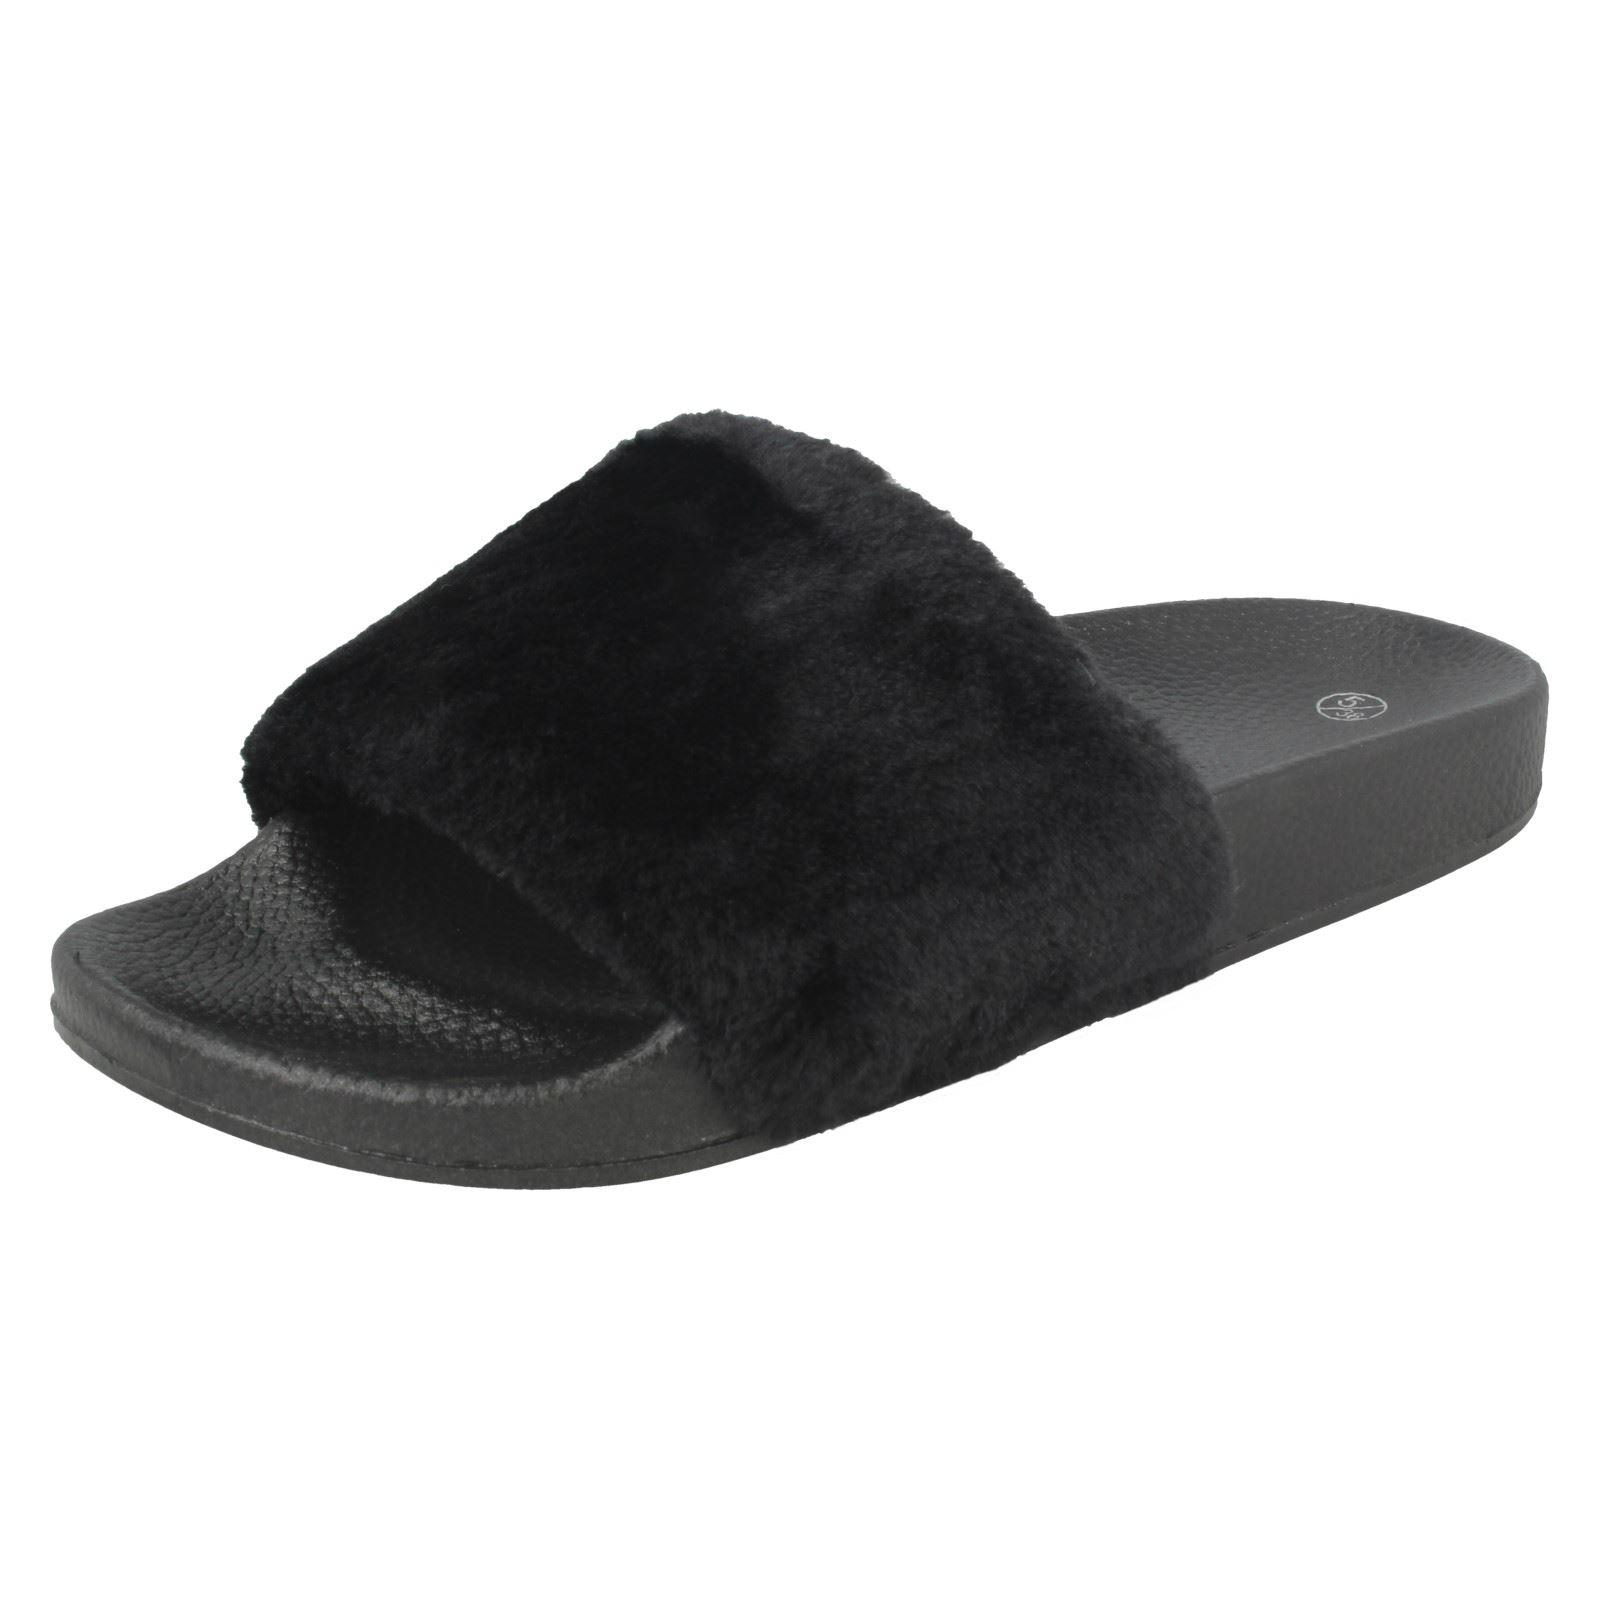 Damas Spot on furia Slip-On Sandalias